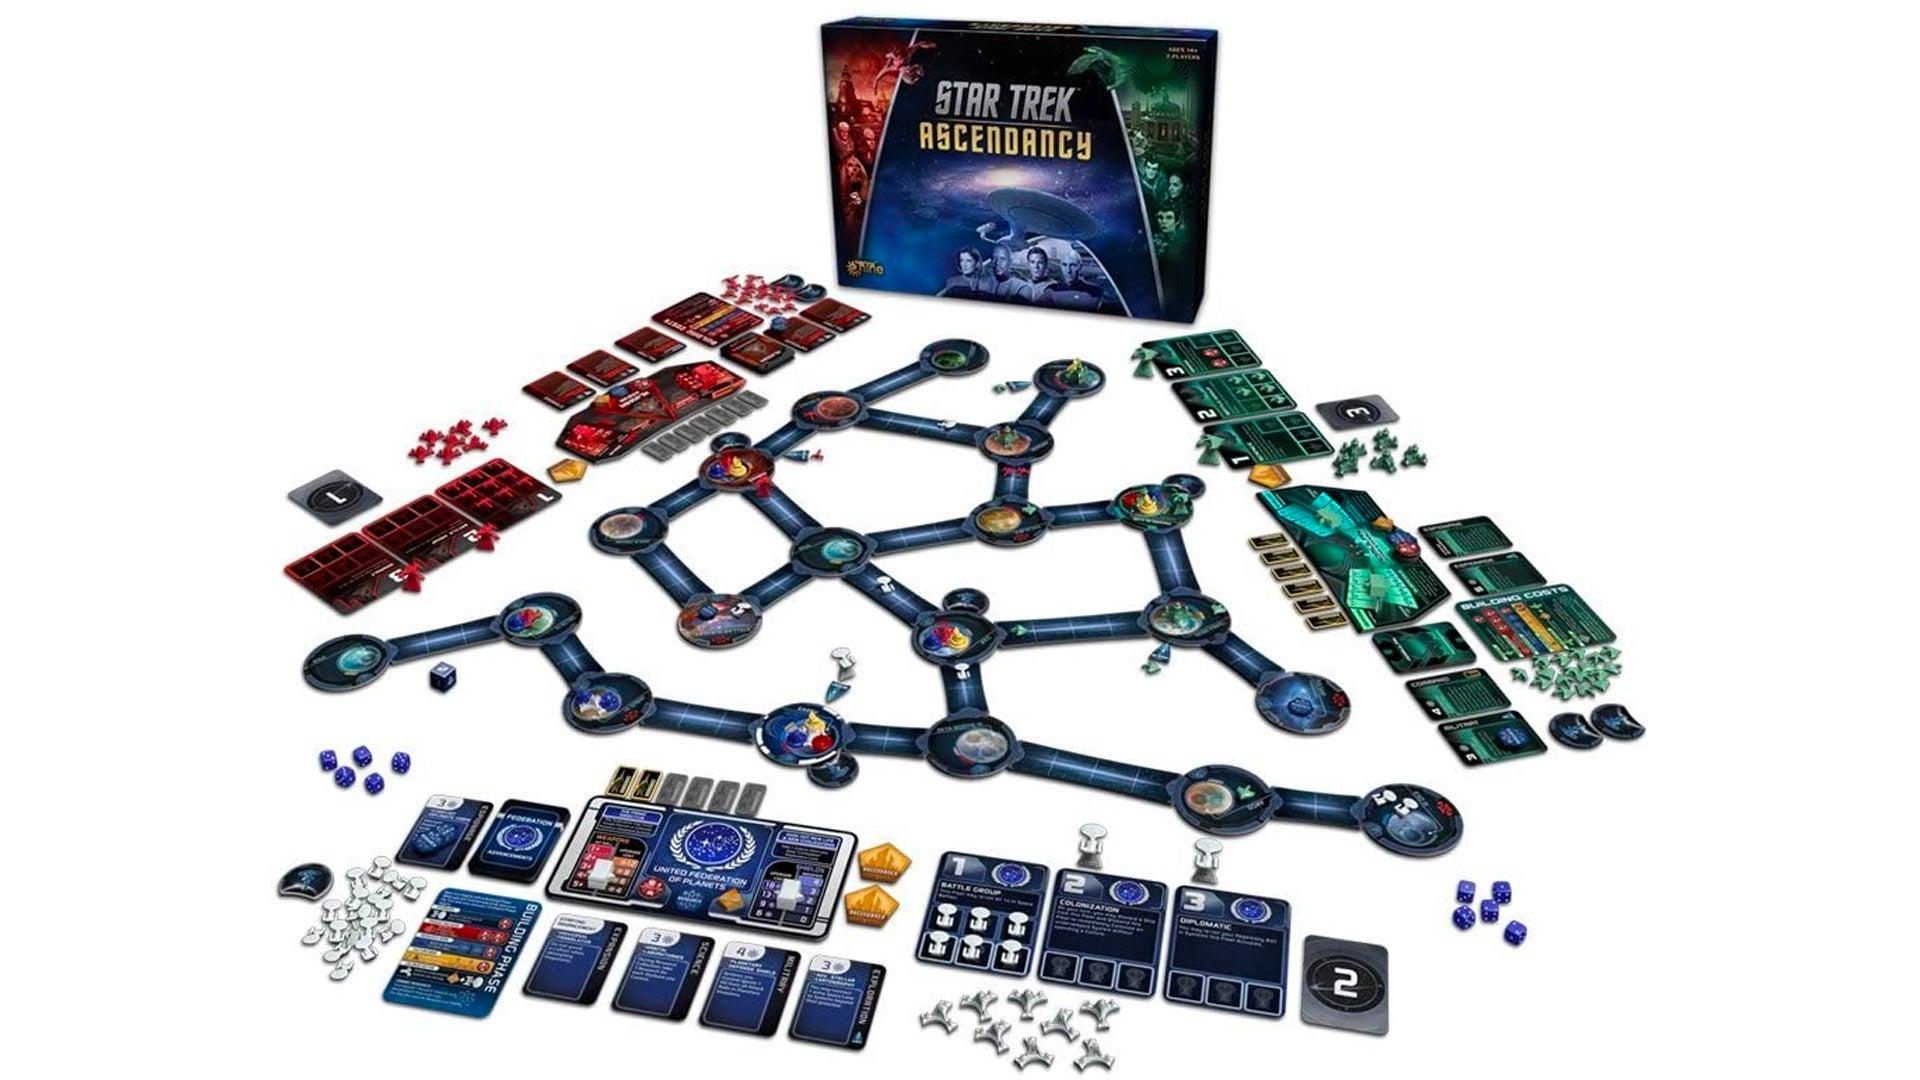 star-trek-ascendancy-board-game-gameplay.jpg